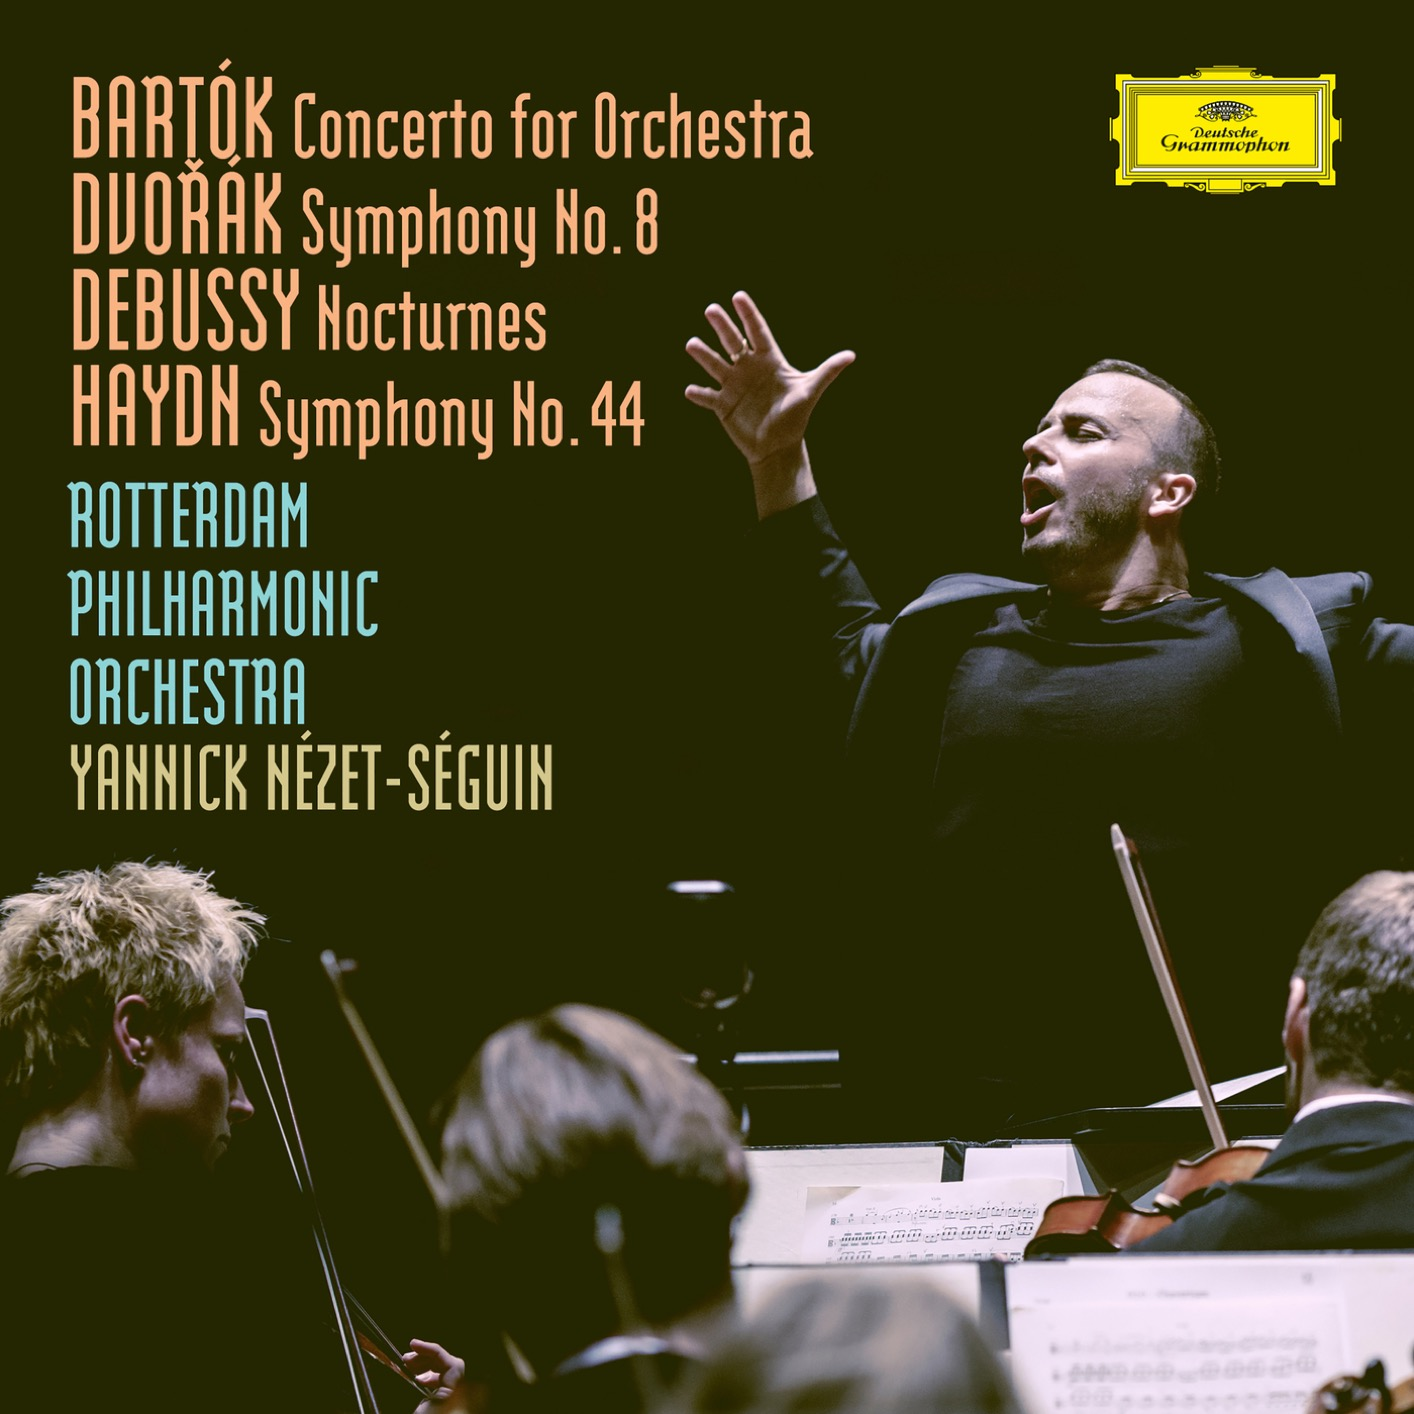 Rotterdam Philharmonic Orchestra Yannick N Zet S Guin Bart K Concerto